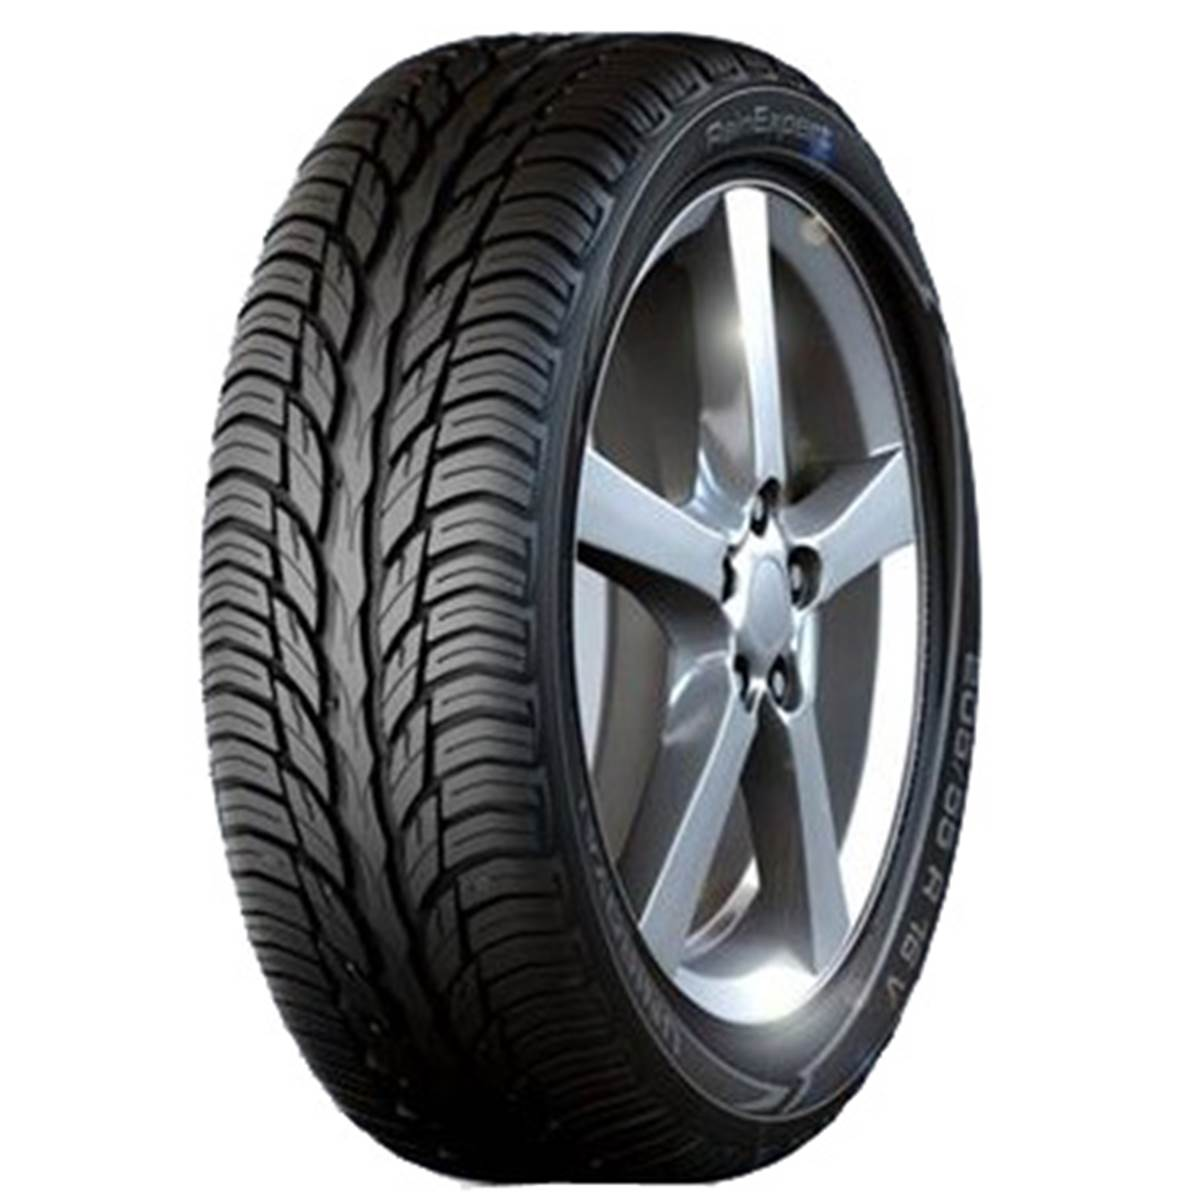 Uniroyal Rain Expert pneu